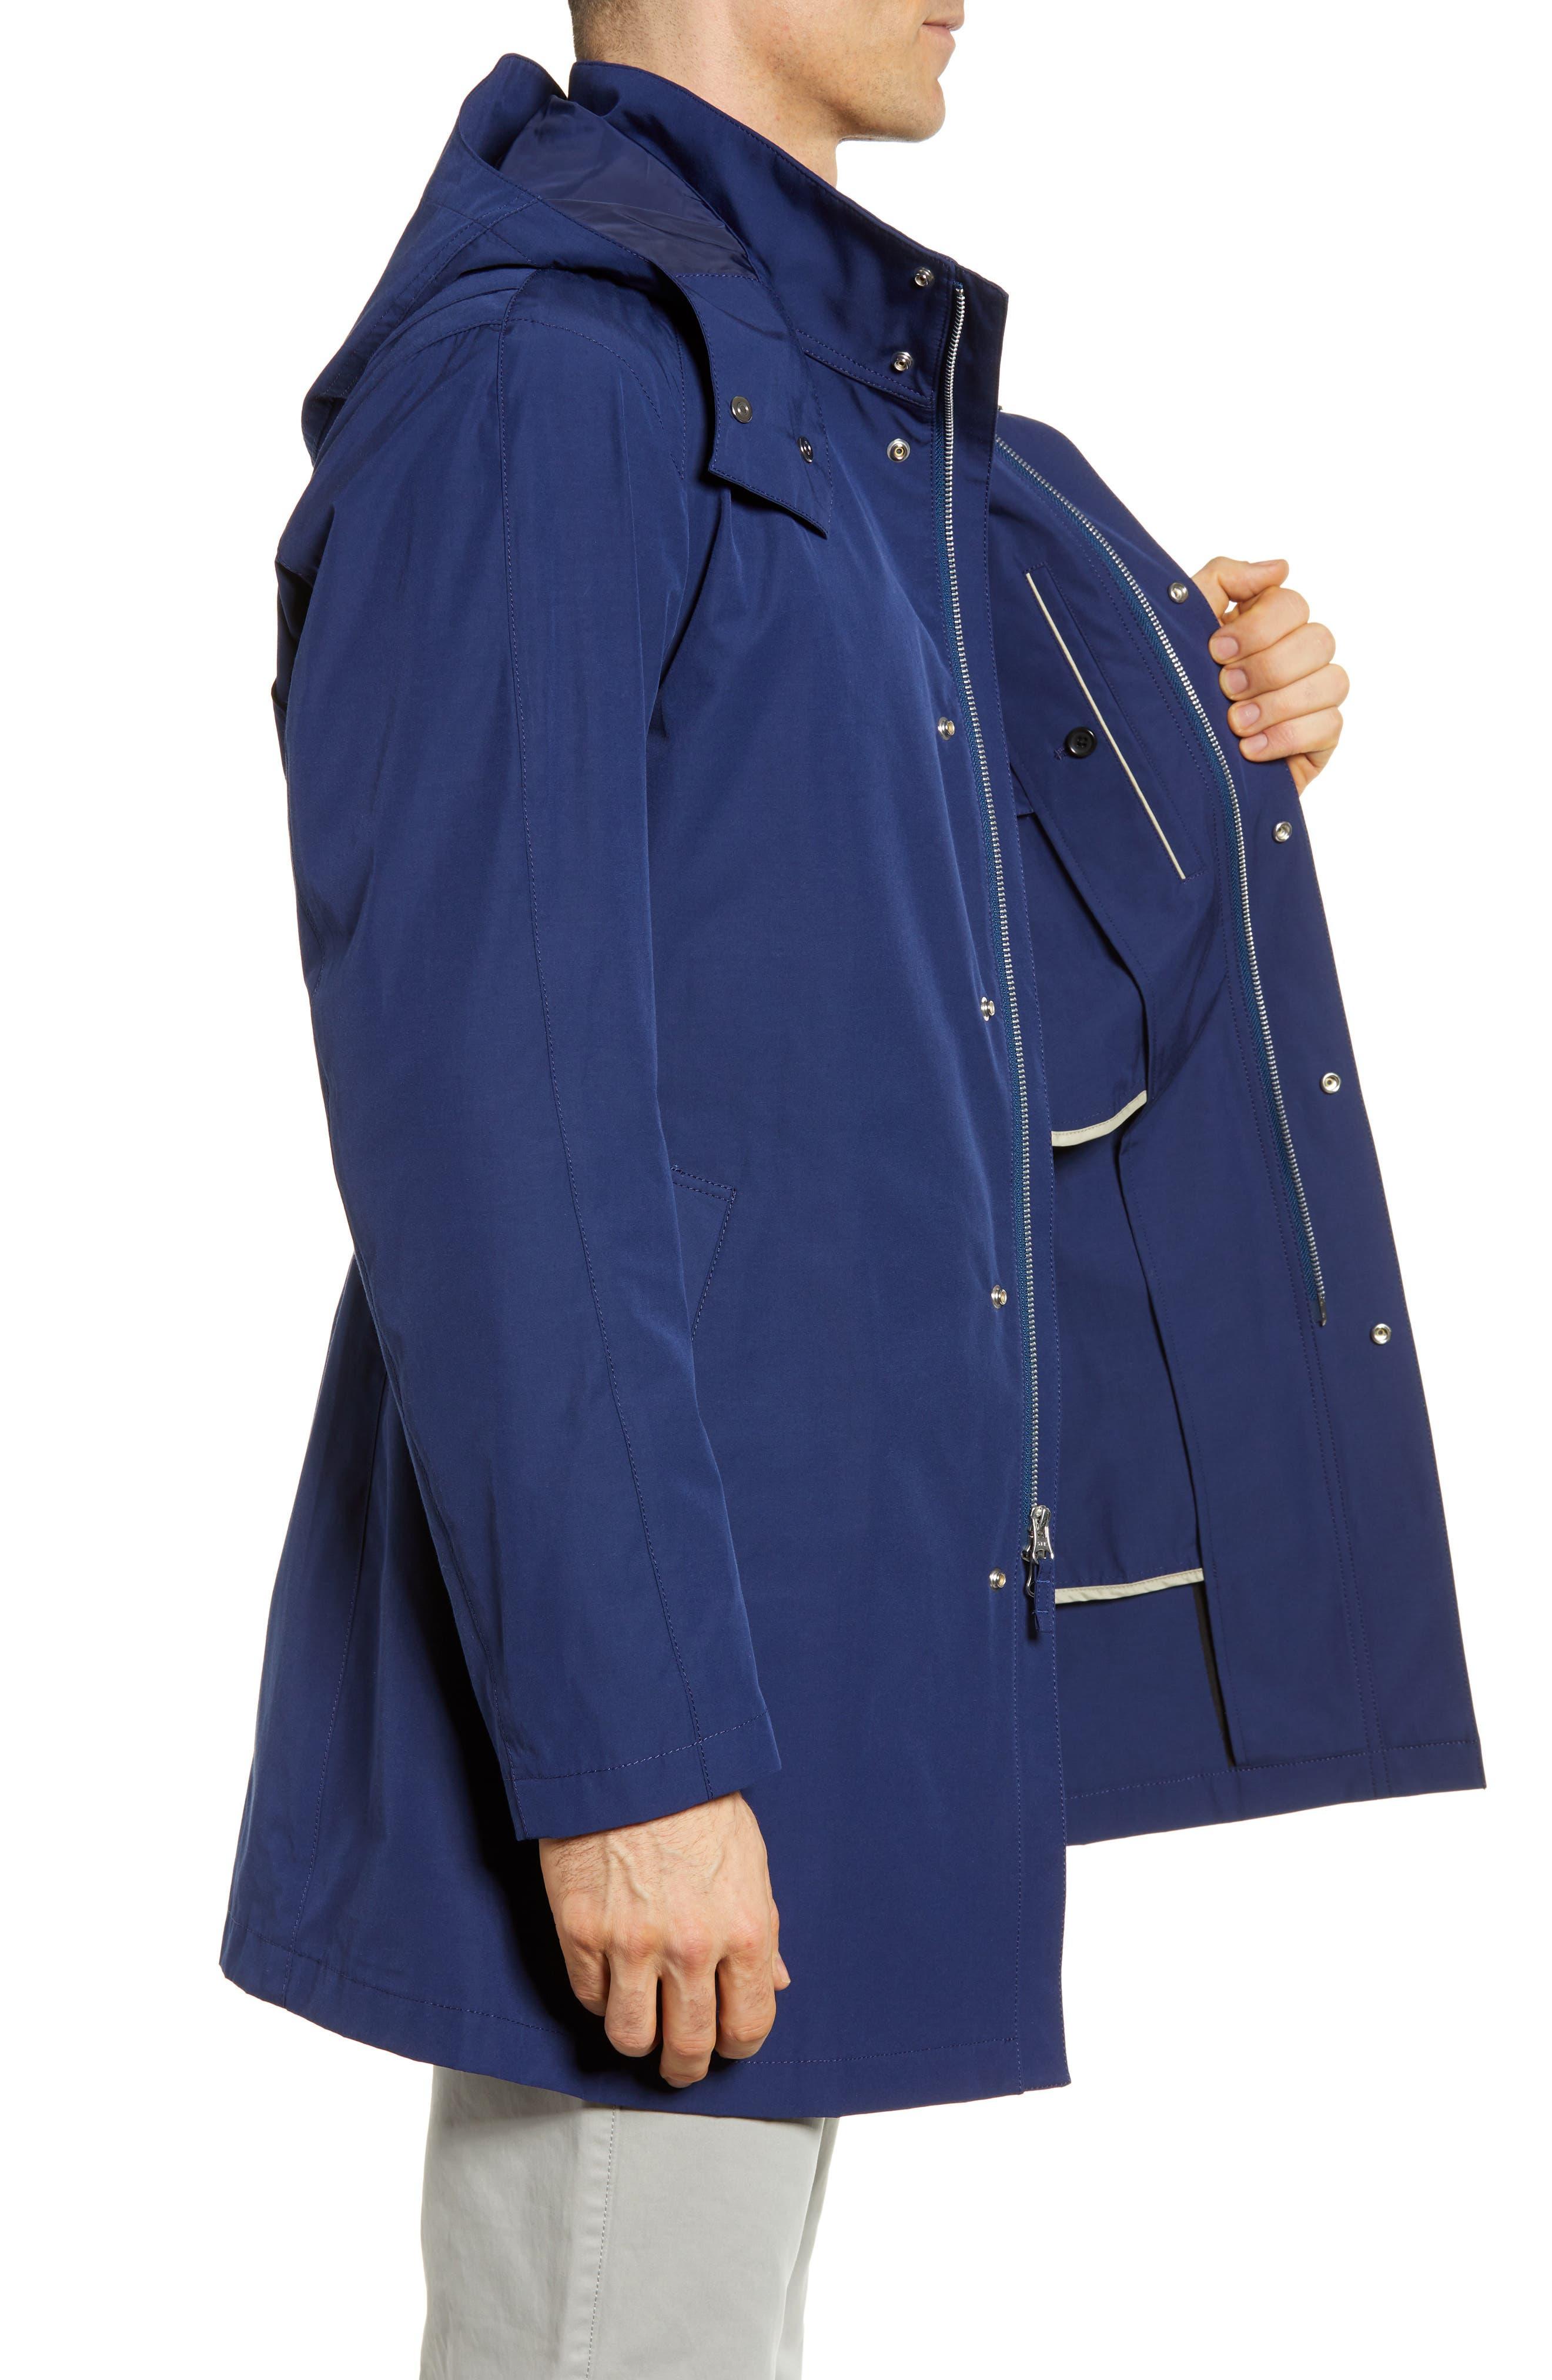 Getaway Raincoat,                             Alternate thumbnail 3, color,                             Royal Blue